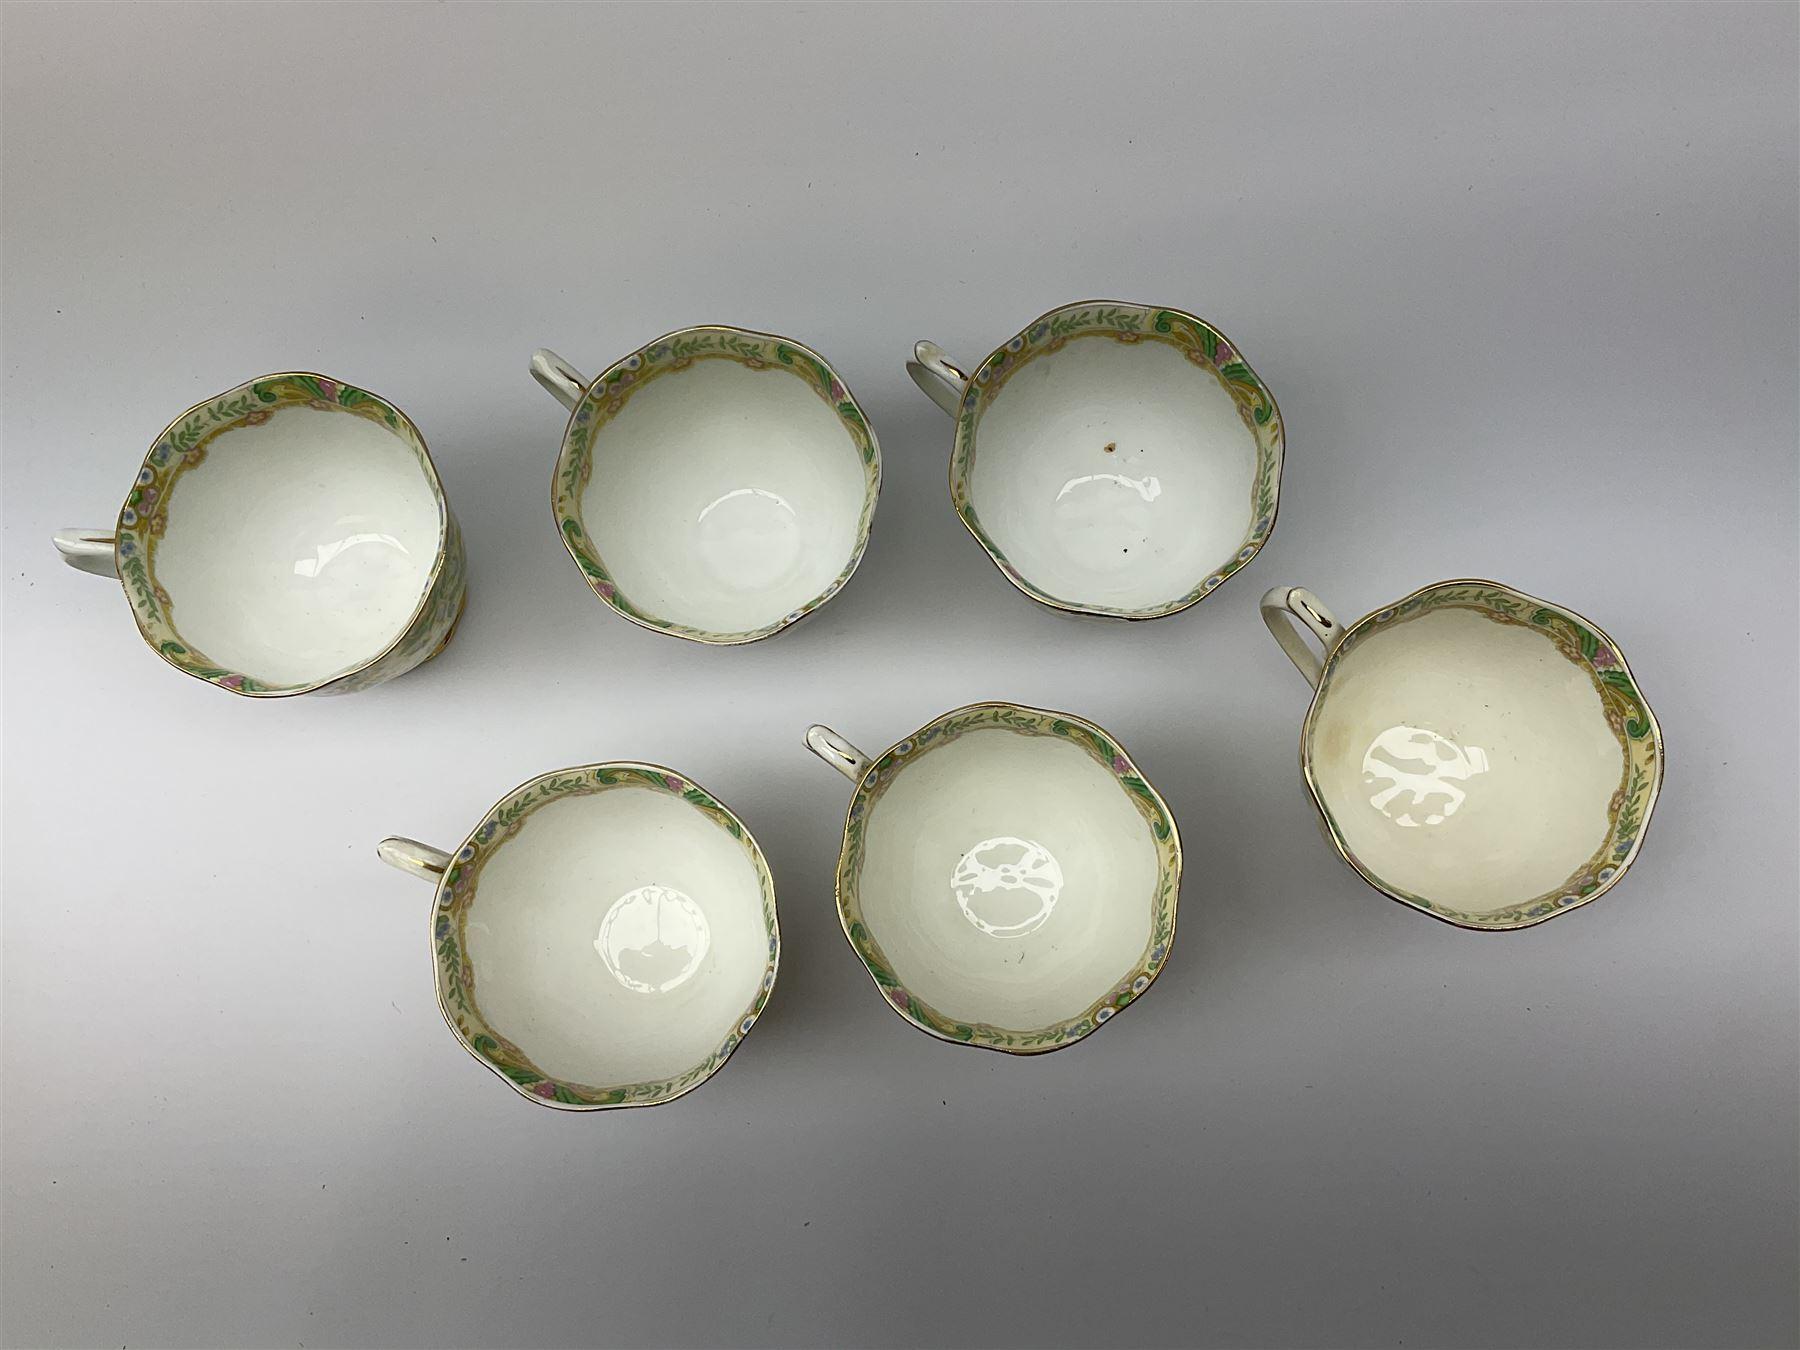 Royal Albert 'Paisley Shawl' pattern part tea set - Image 5 of 12